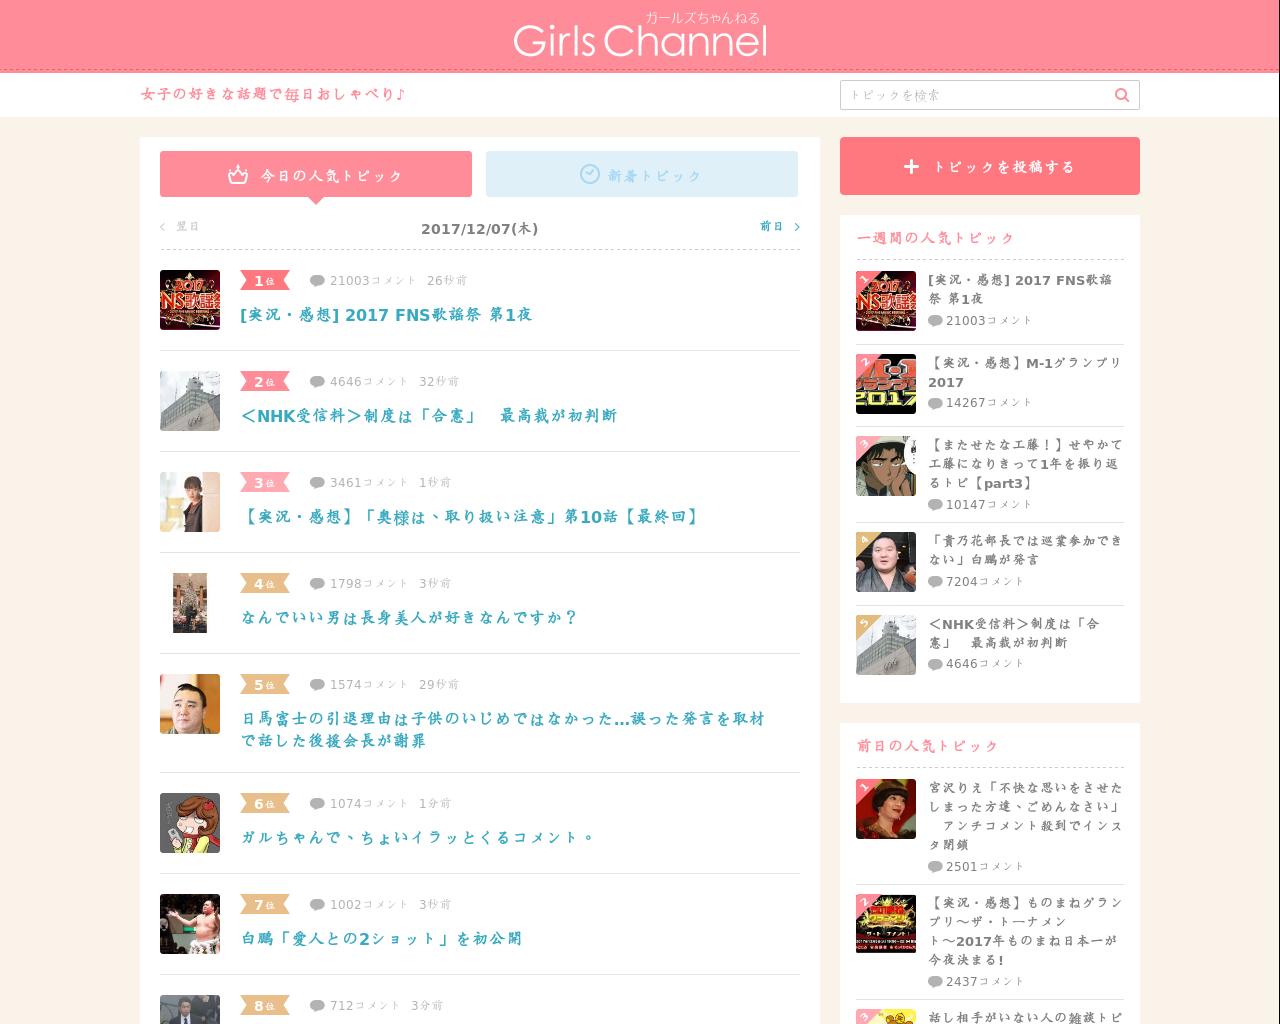 girlschannel.net(2017/12/04 09:20:23)